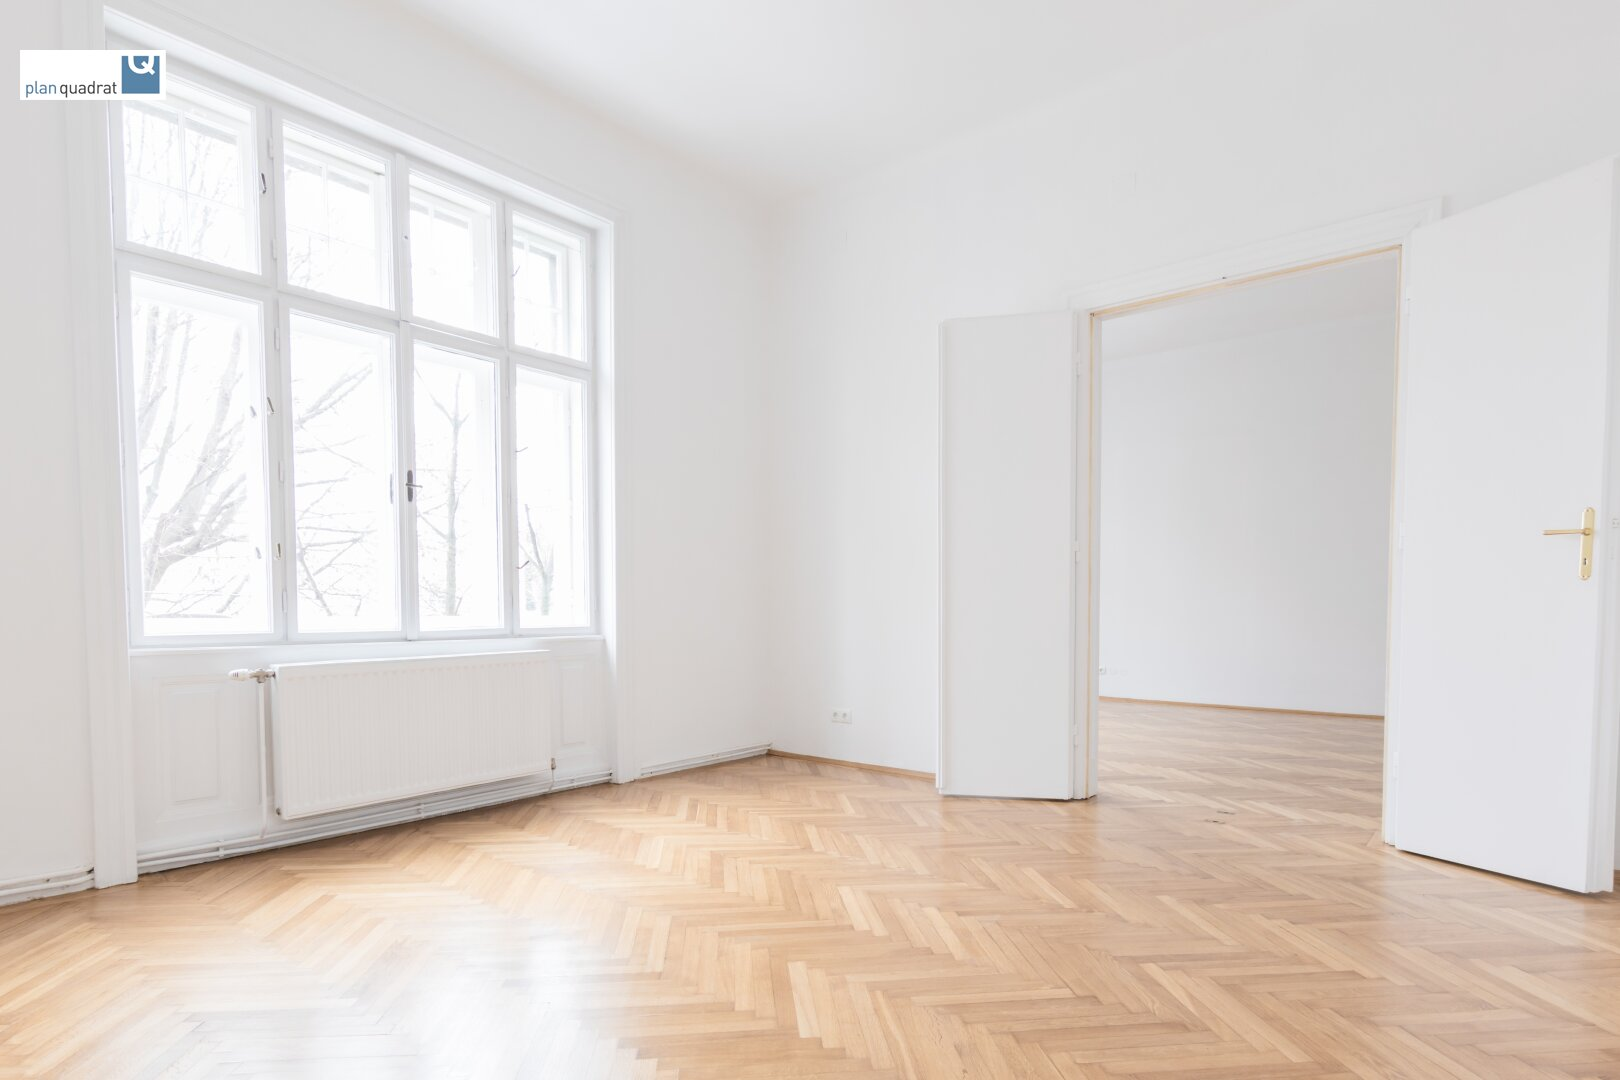 Zimmer 2 (gem. Plan; ca. 19,20 qm)